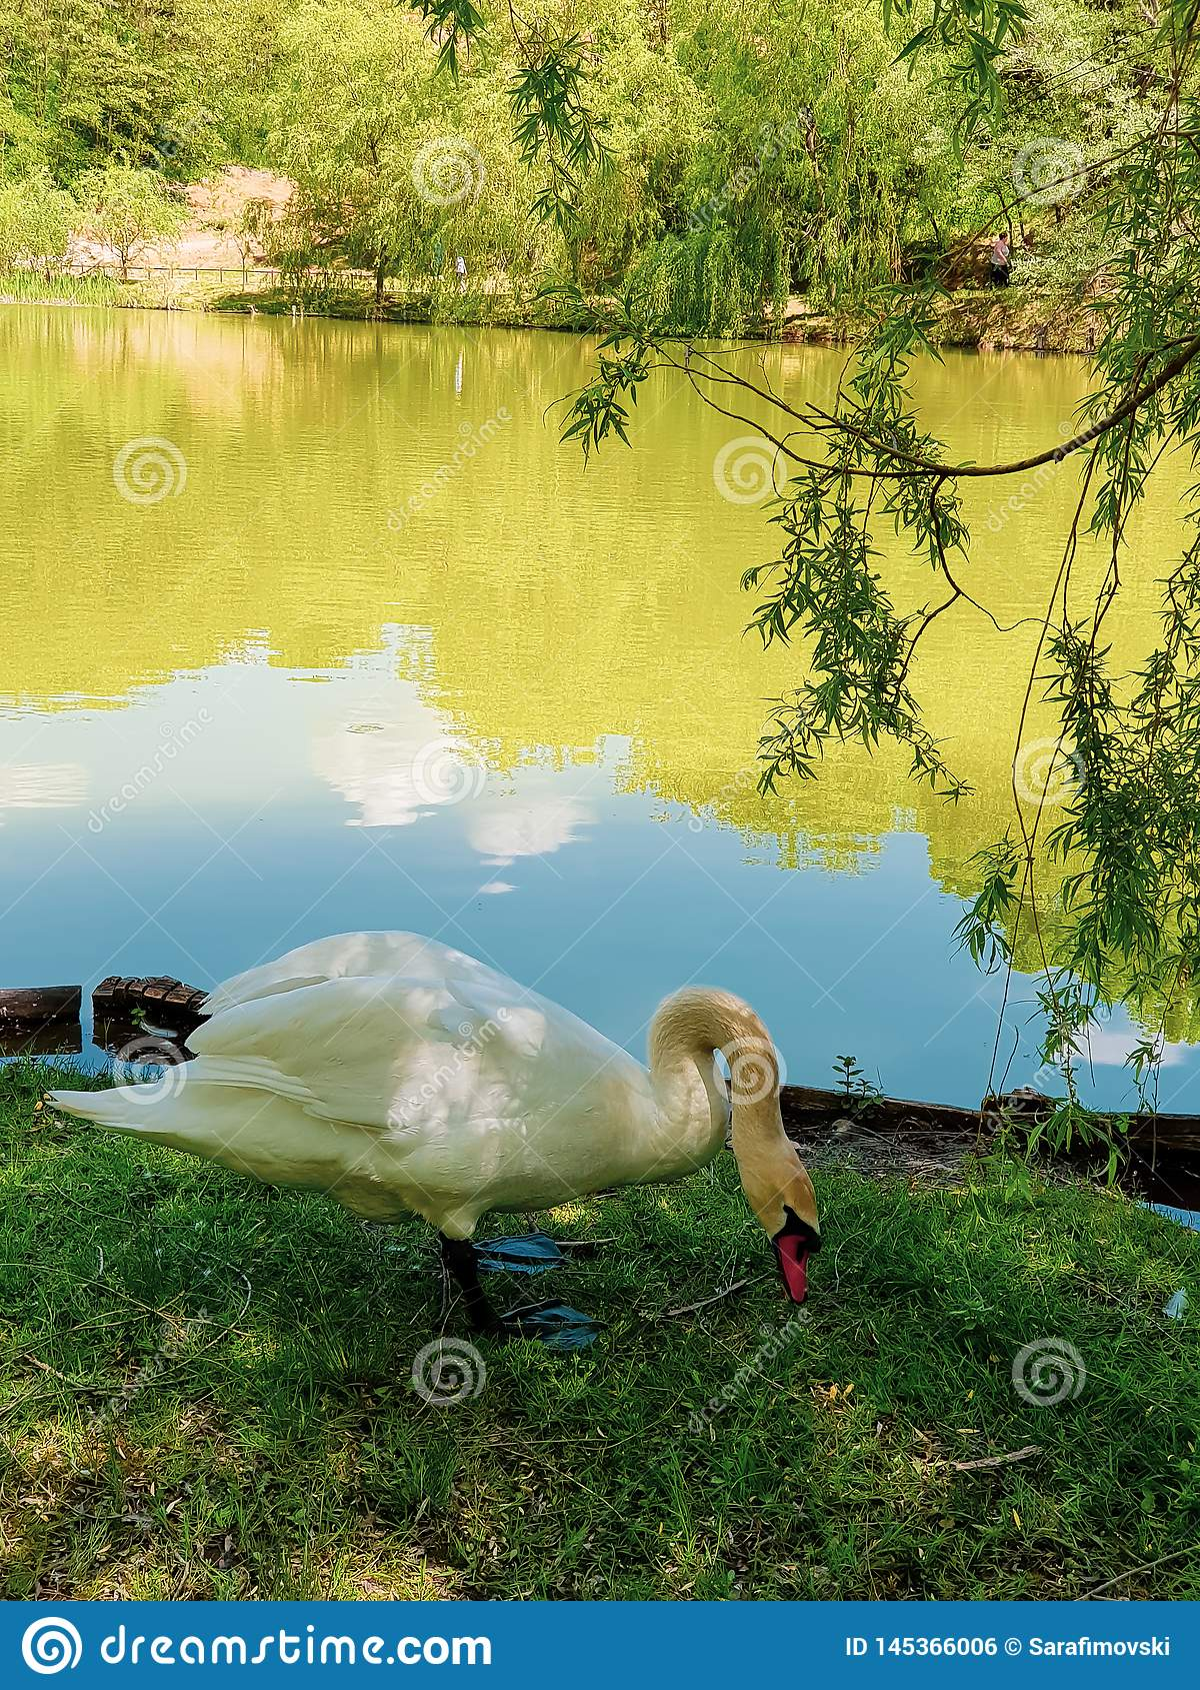 Beautiful swan enjoying near lake. Hungry swan eating under small tree.